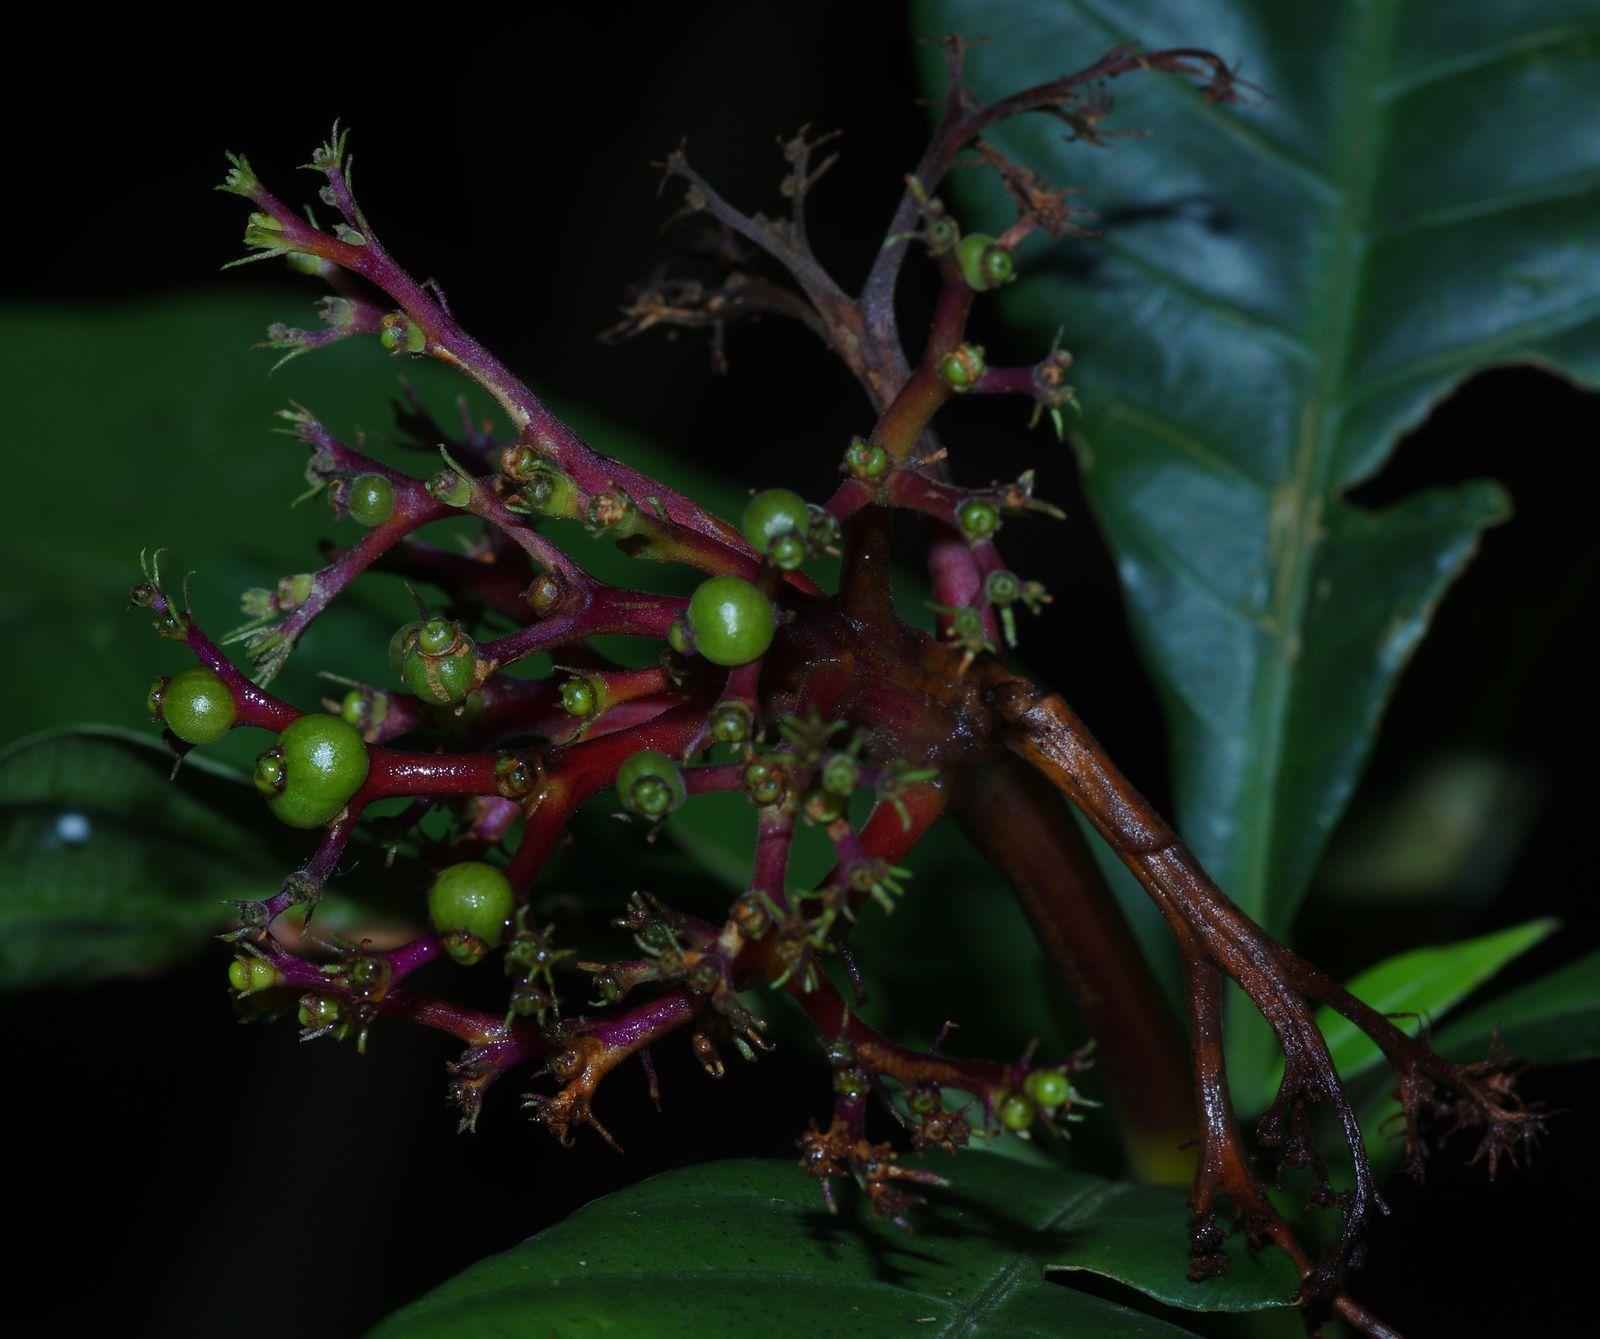 Palicourea quadrifolia